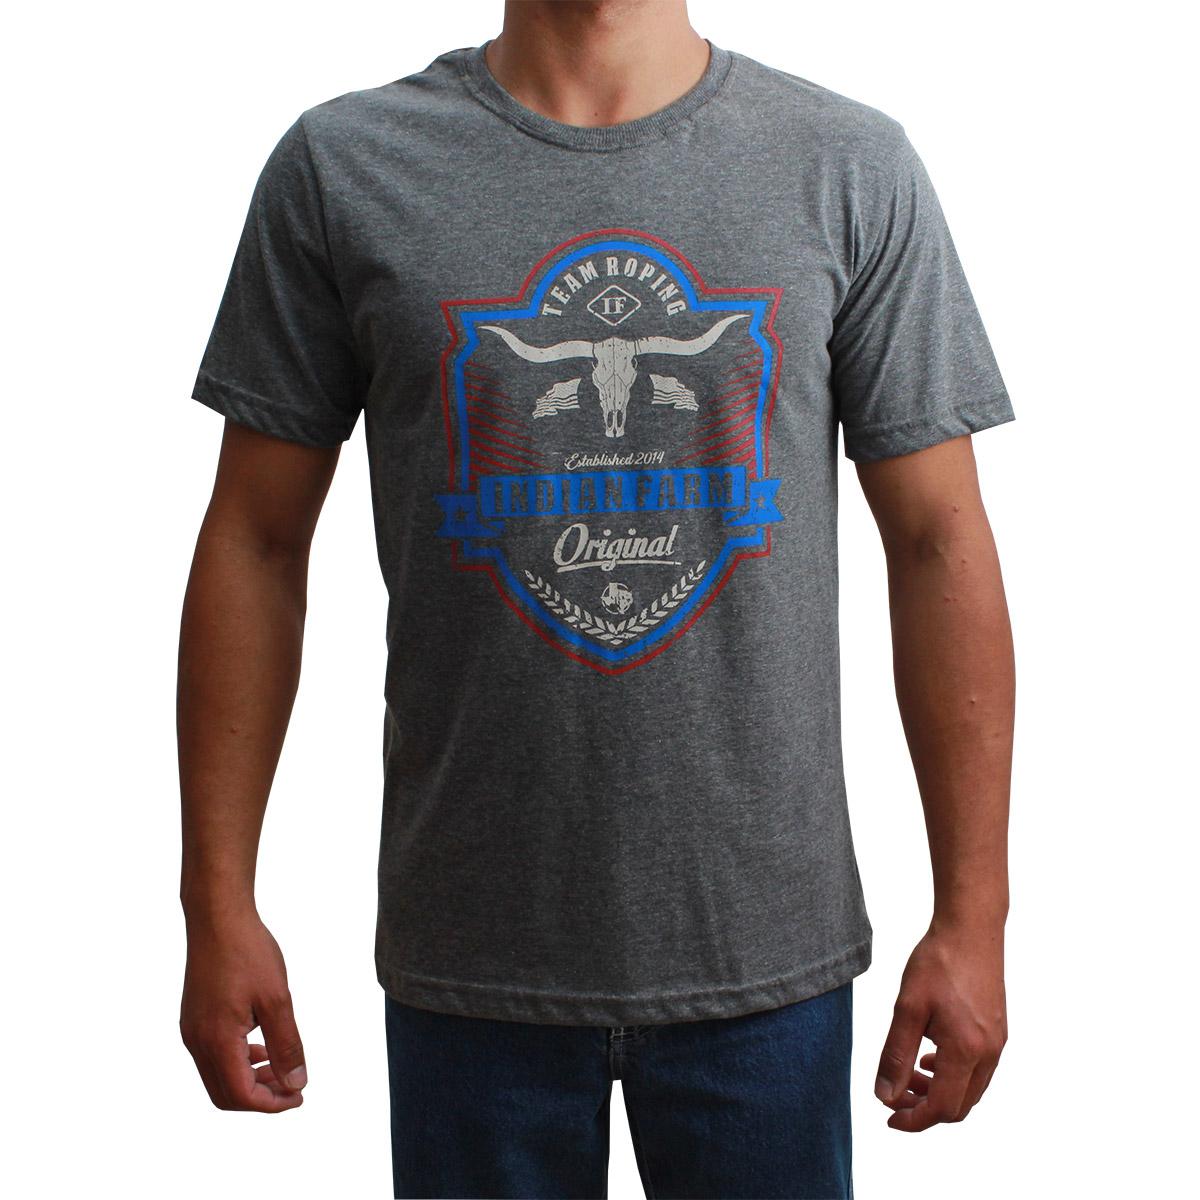 Camiseta Indian Farm Masculina Team Roping Cinza